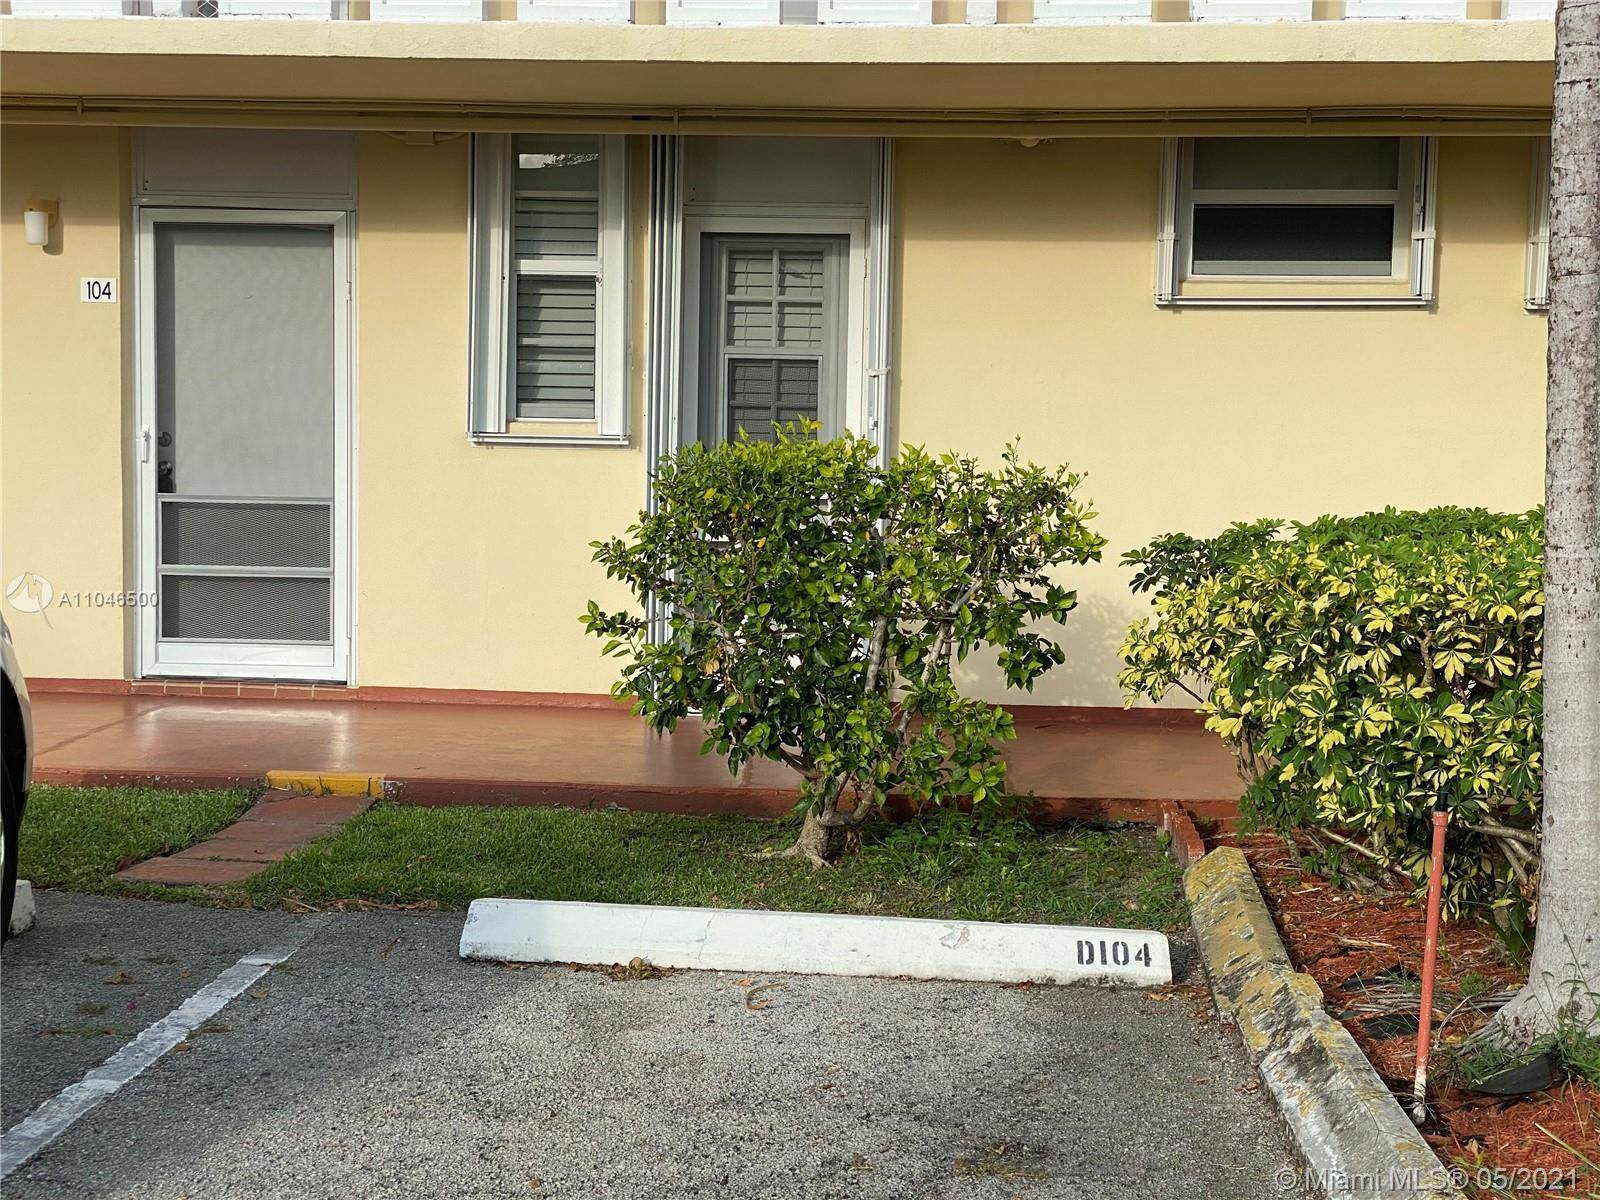 2980 Point East Dr, #D104, Aventura, FL 33160